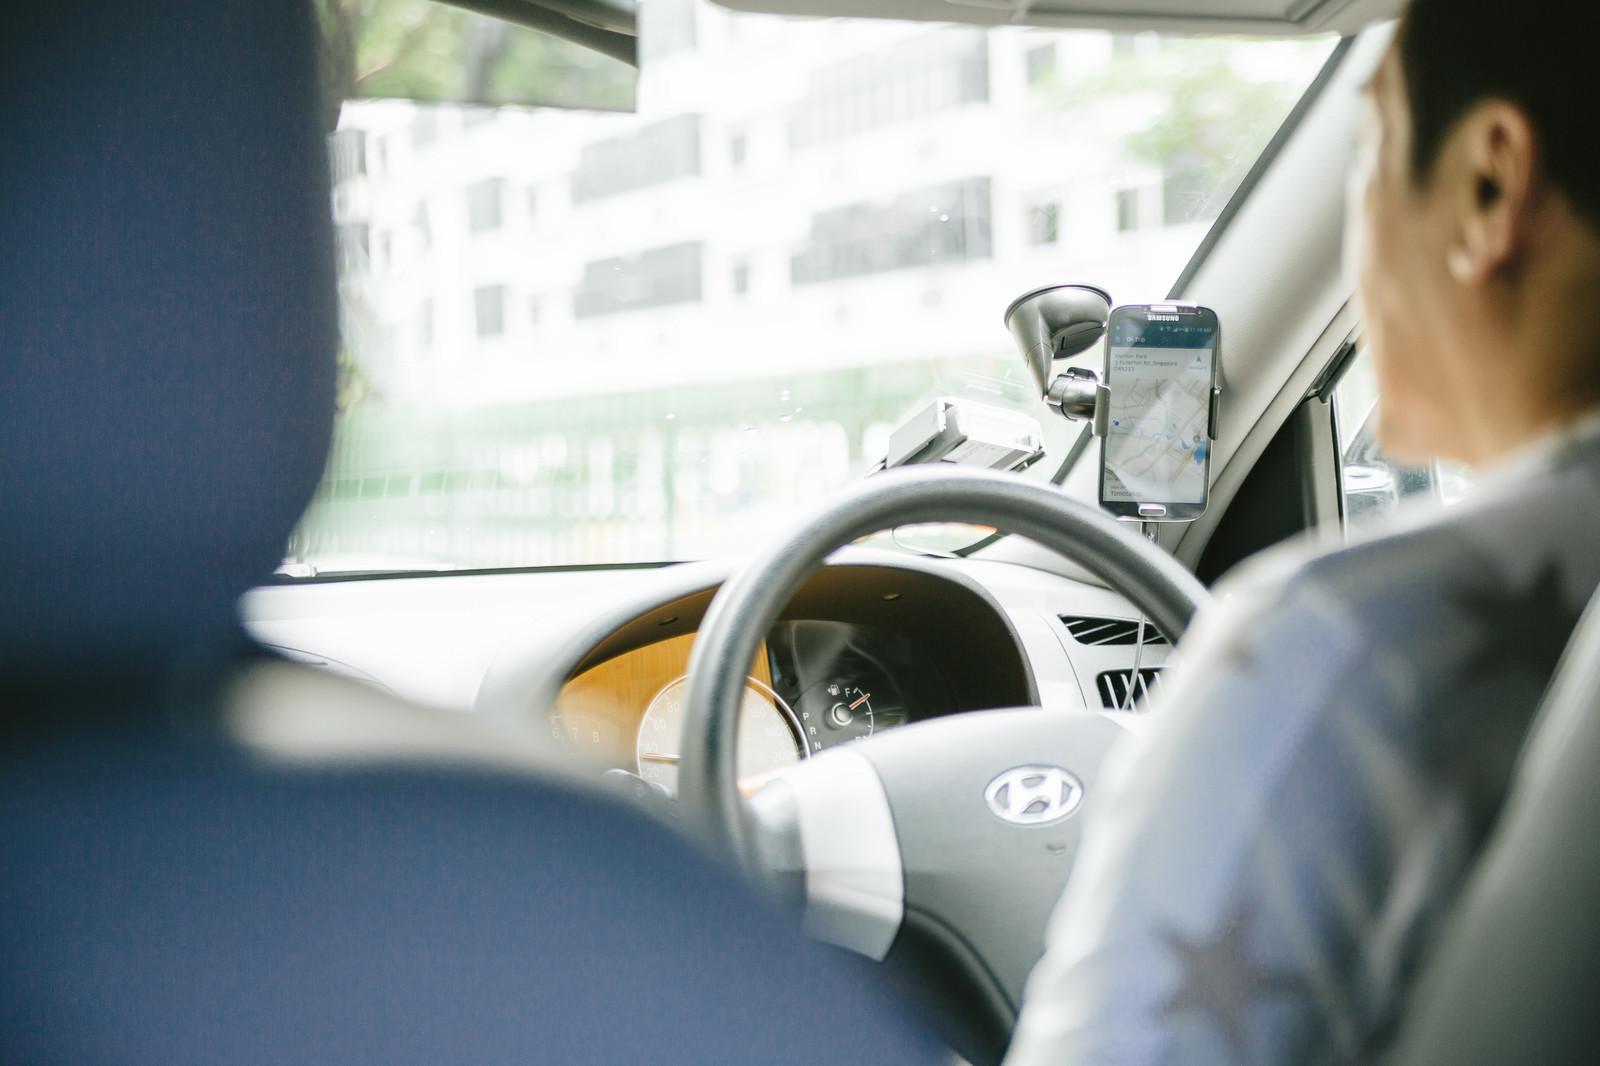 TAXI0I9A3710 TP V 1 - 【TIPS】都内タクシーで電子タバコはやはりダメ!納得できる理由と未来とは?